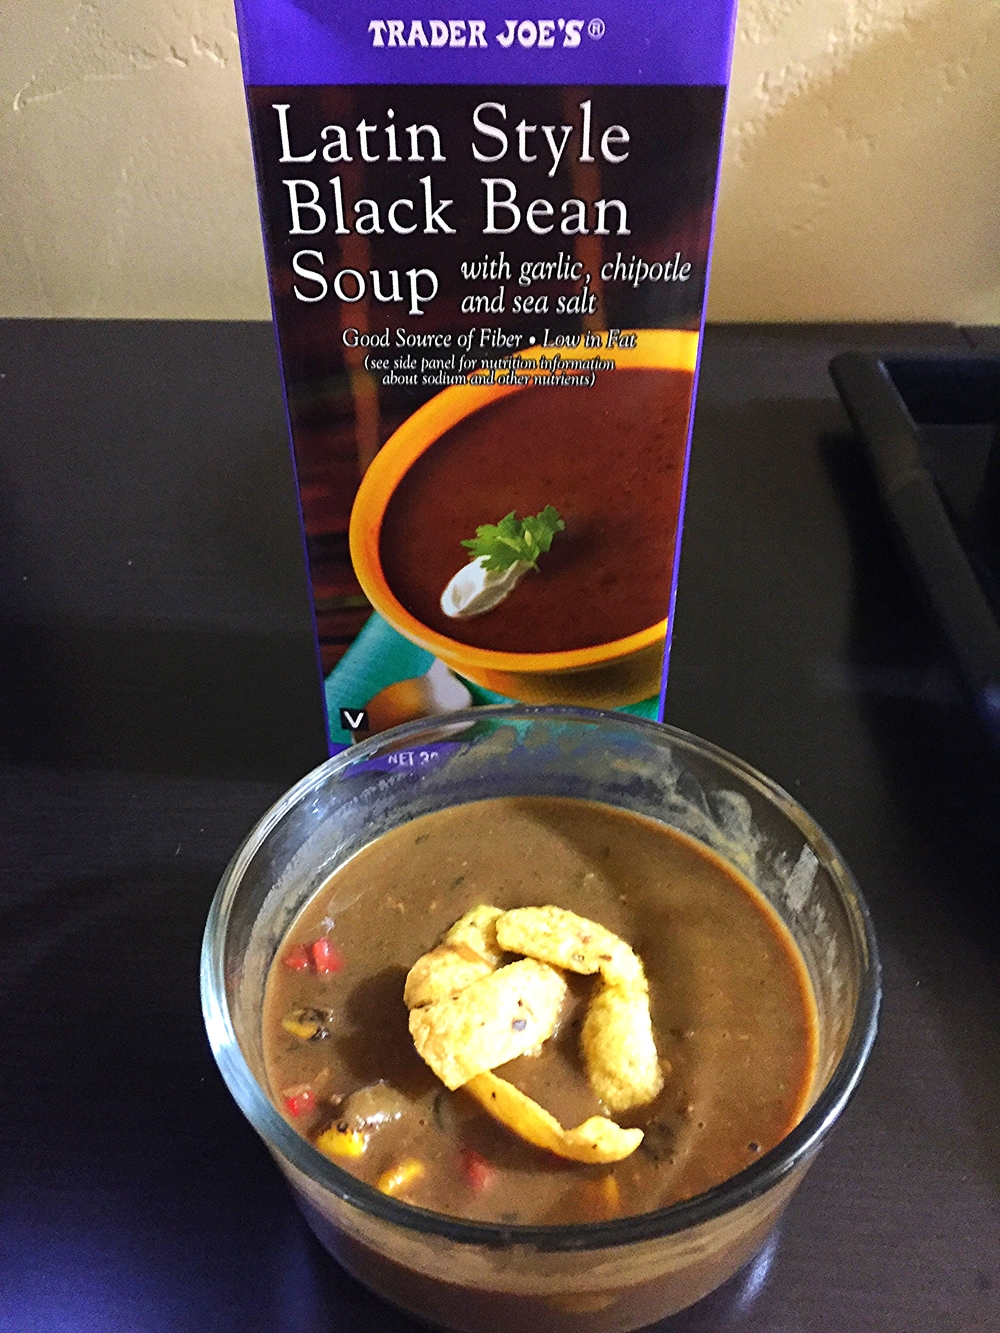 Black bean soup with meatless grounds, roasted corn and fajita veggies